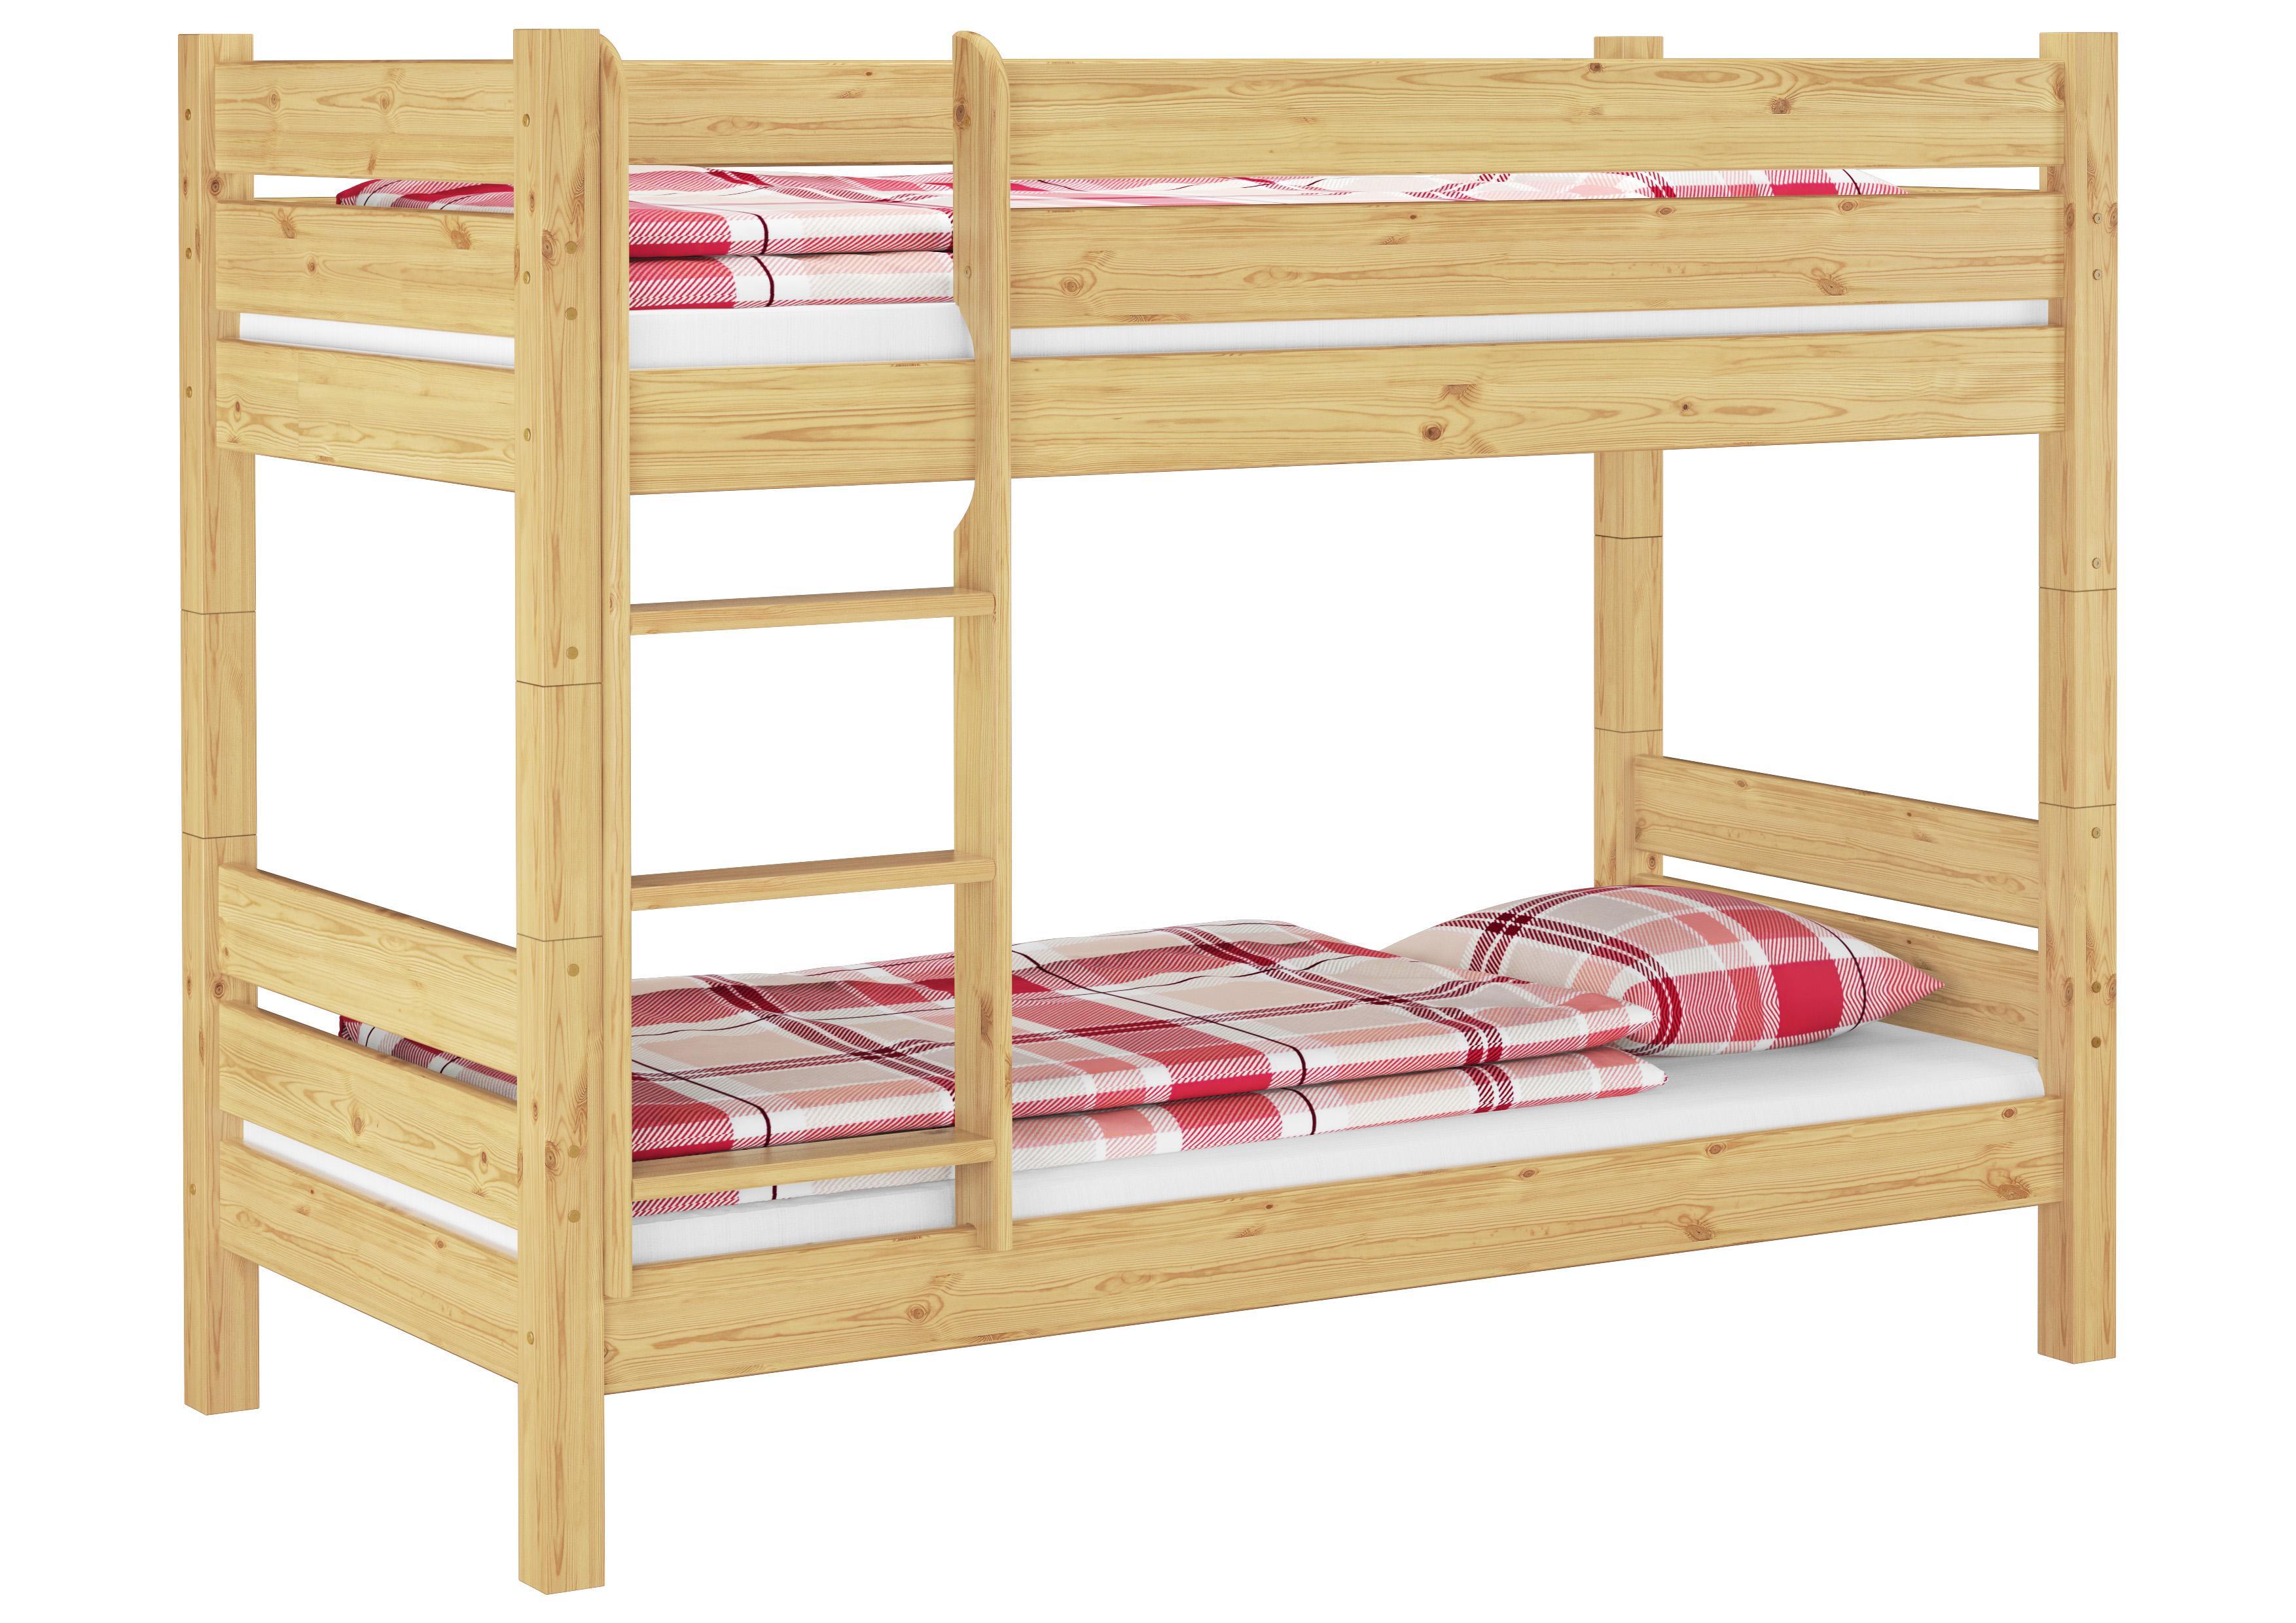 erst holz etagenbett extra stabil massivholz 80x200 stockbett nische 80 teilbar rollroste. Black Bedroom Furniture Sets. Home Design Ideas